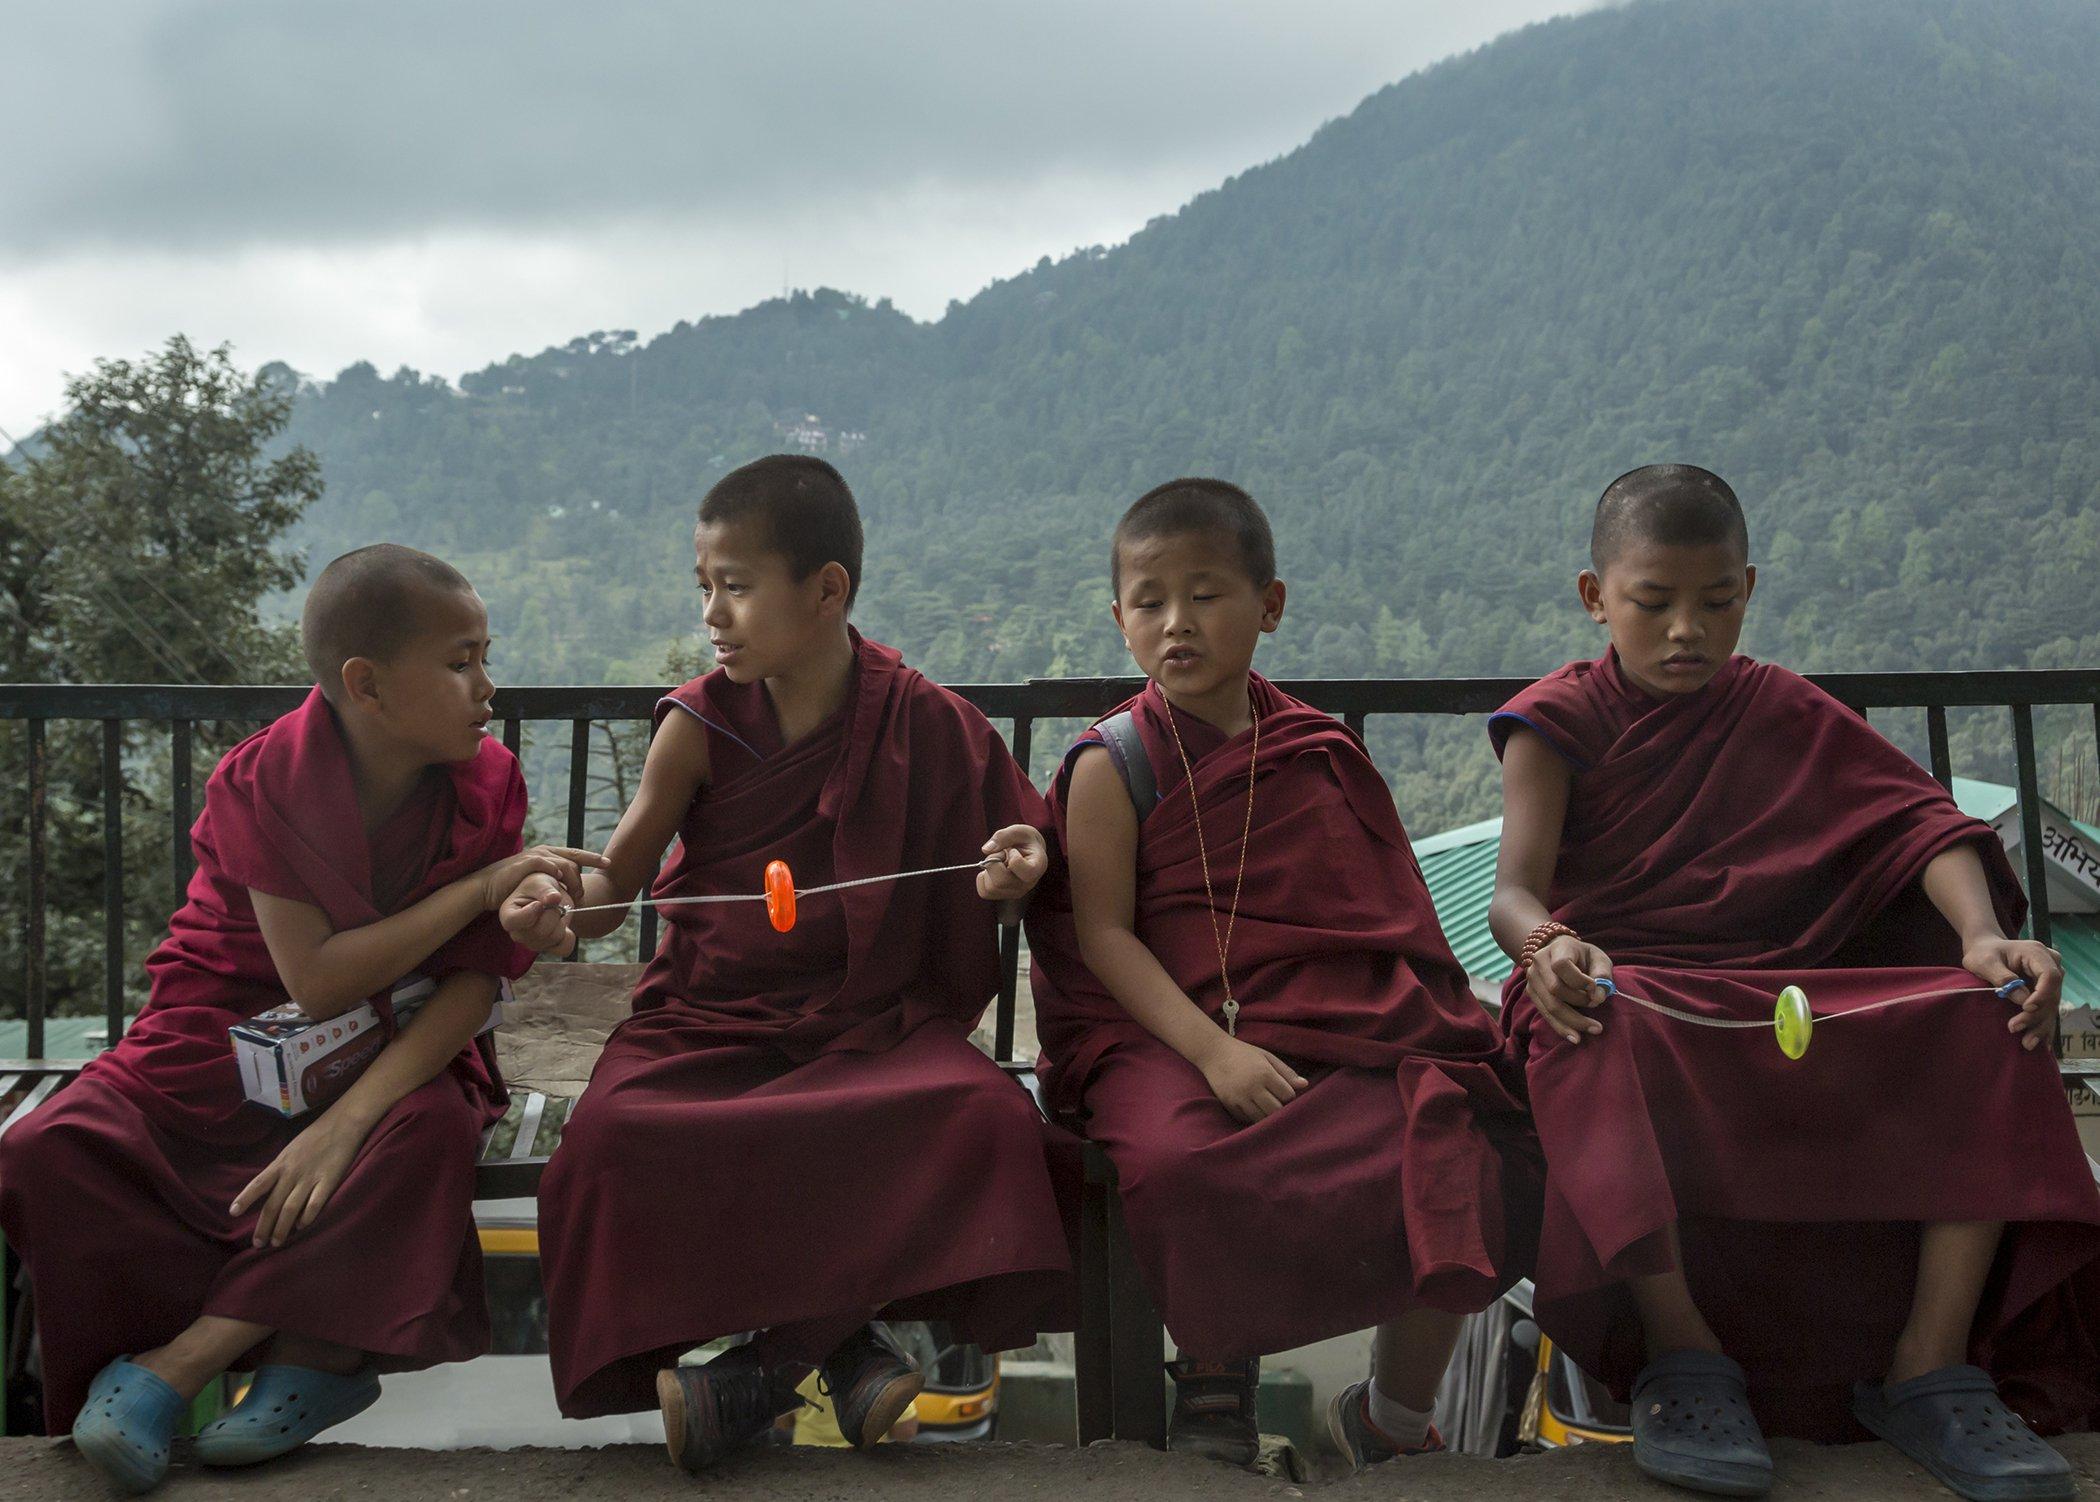 Kids-India-Buddhist-Monks.jpg